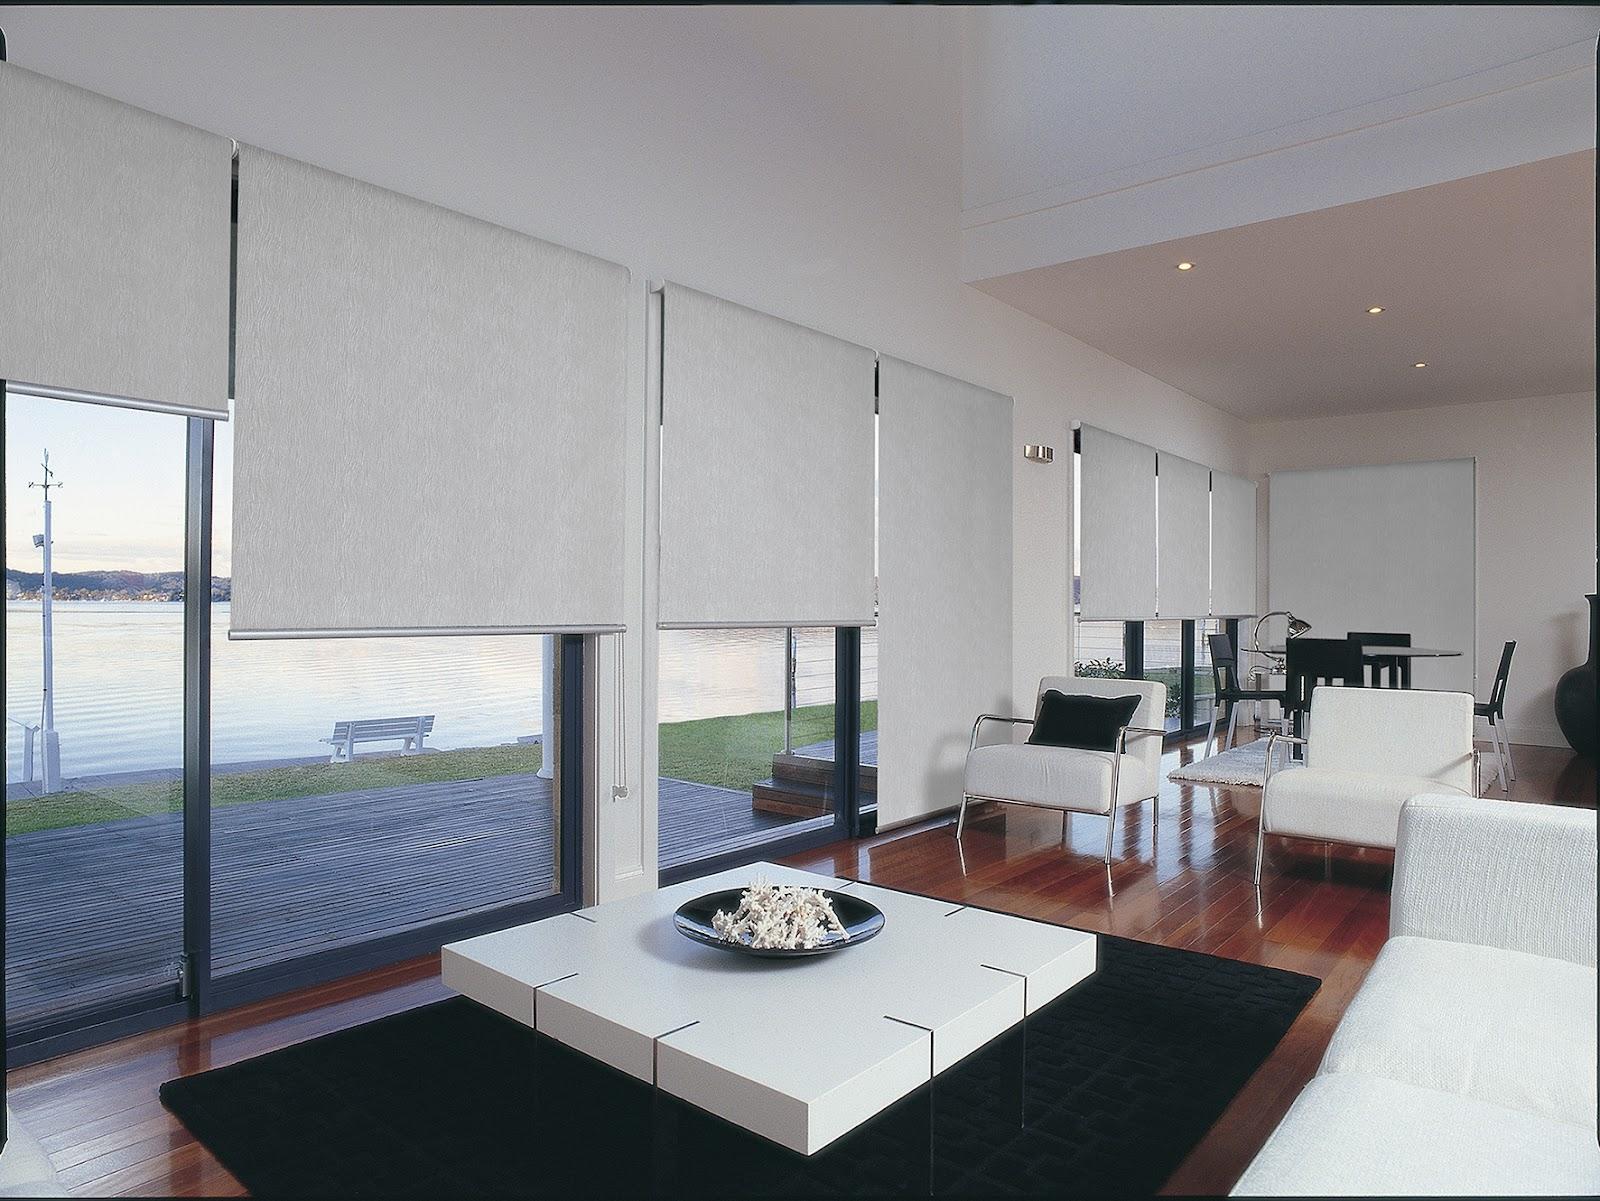 Luxaflex Australia: New Roller Blind Design Gives Luxaflex the EDGE